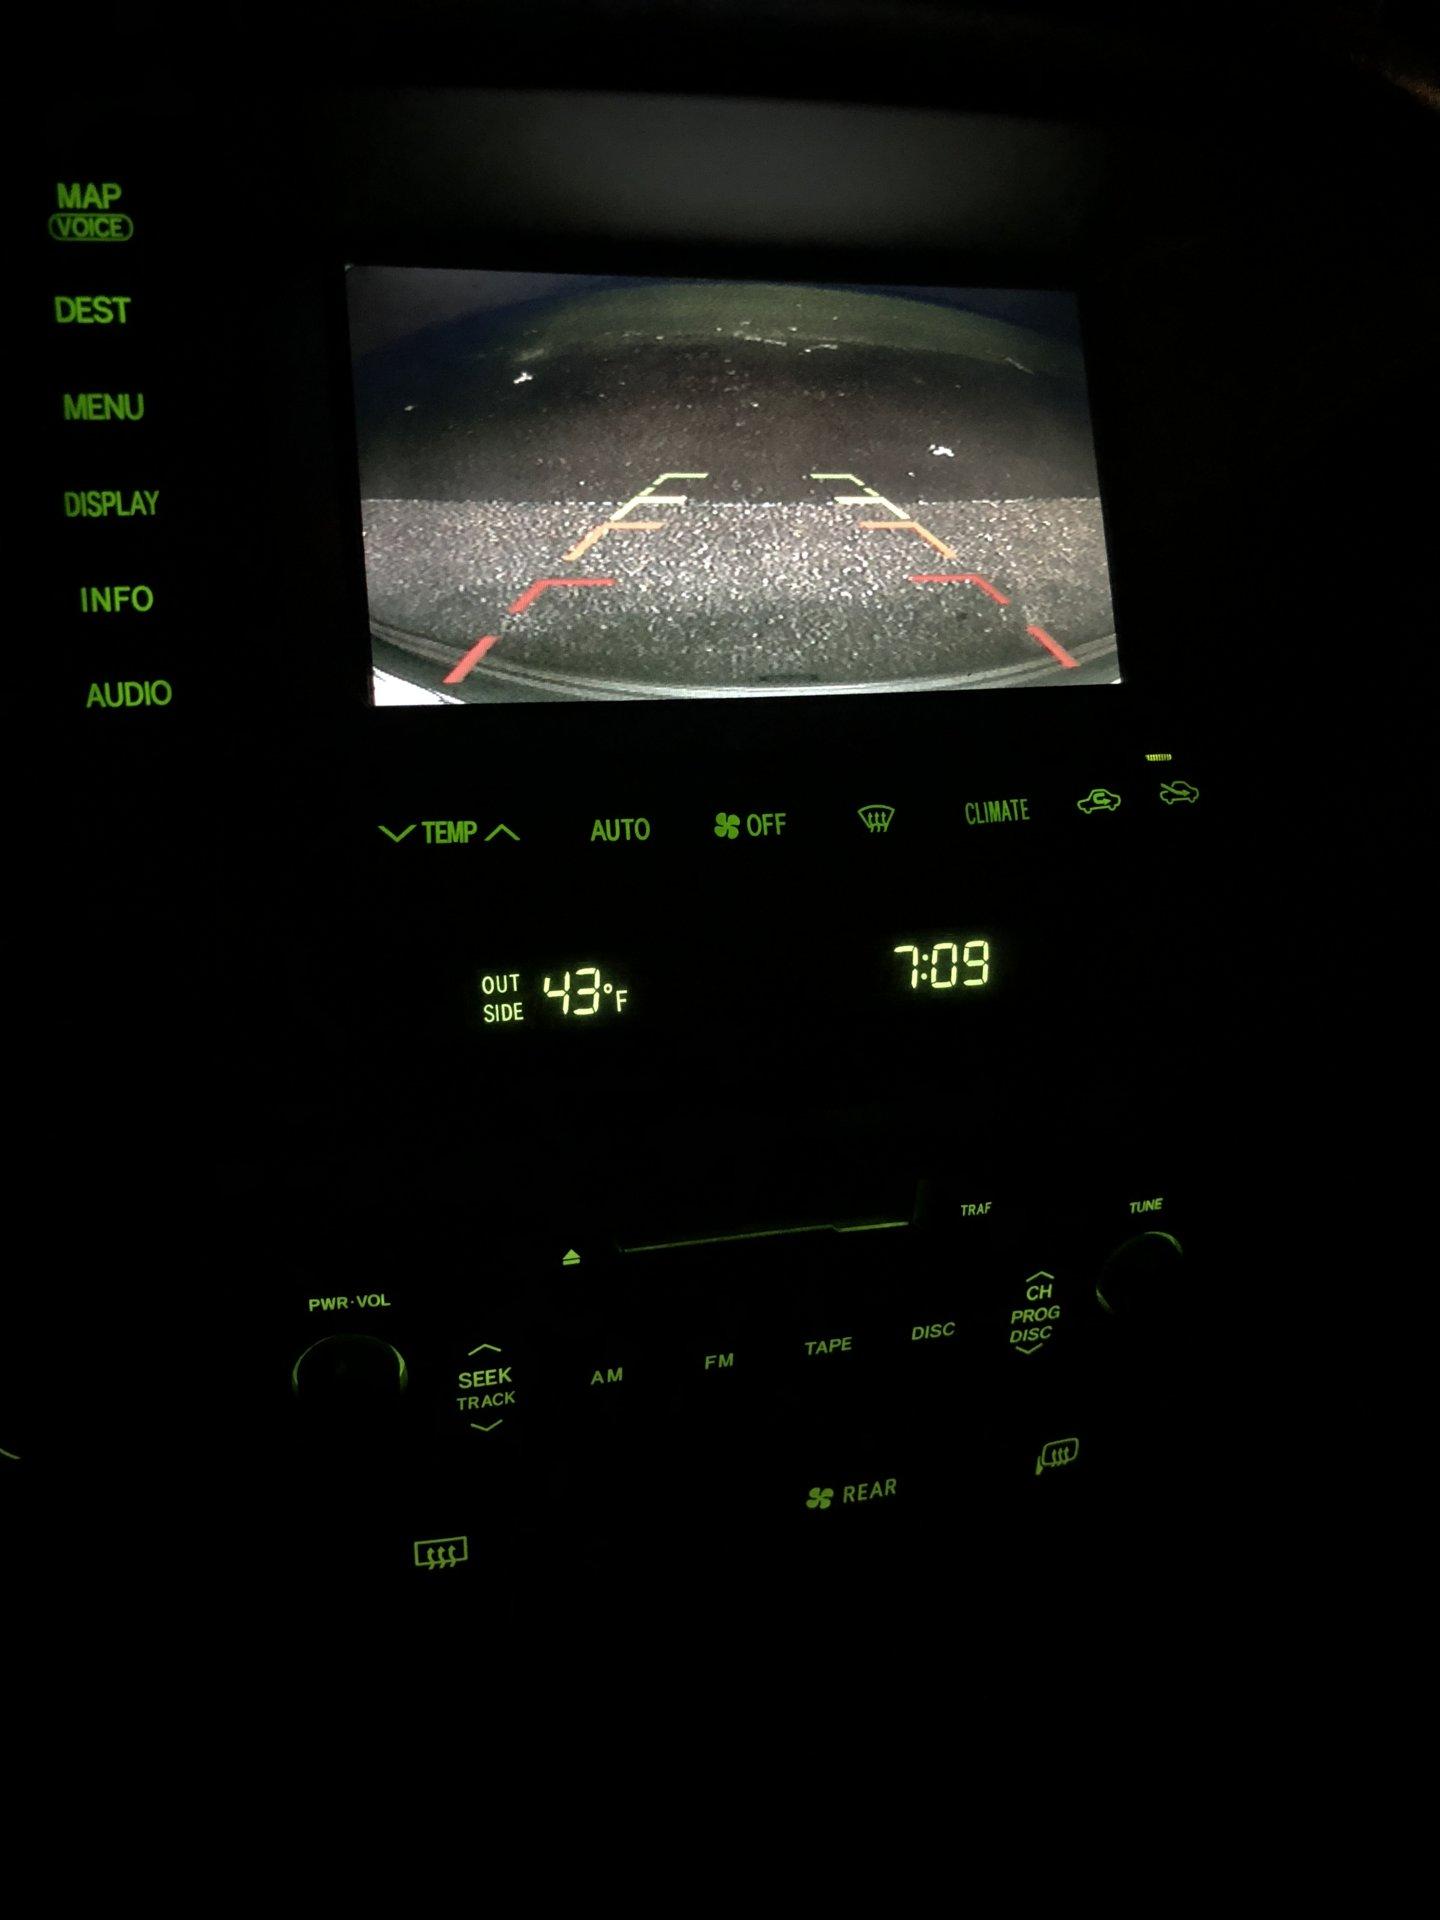 Diy Backup Camera Install 2002 Lexus Lx 470 W Factory Nav Ih8mud Need Wiring Diagram From Radio Harness2002ls430radio3jpg F1a29e95 26f1 4d95 B41f Bfb3f98b5e0fjpeg